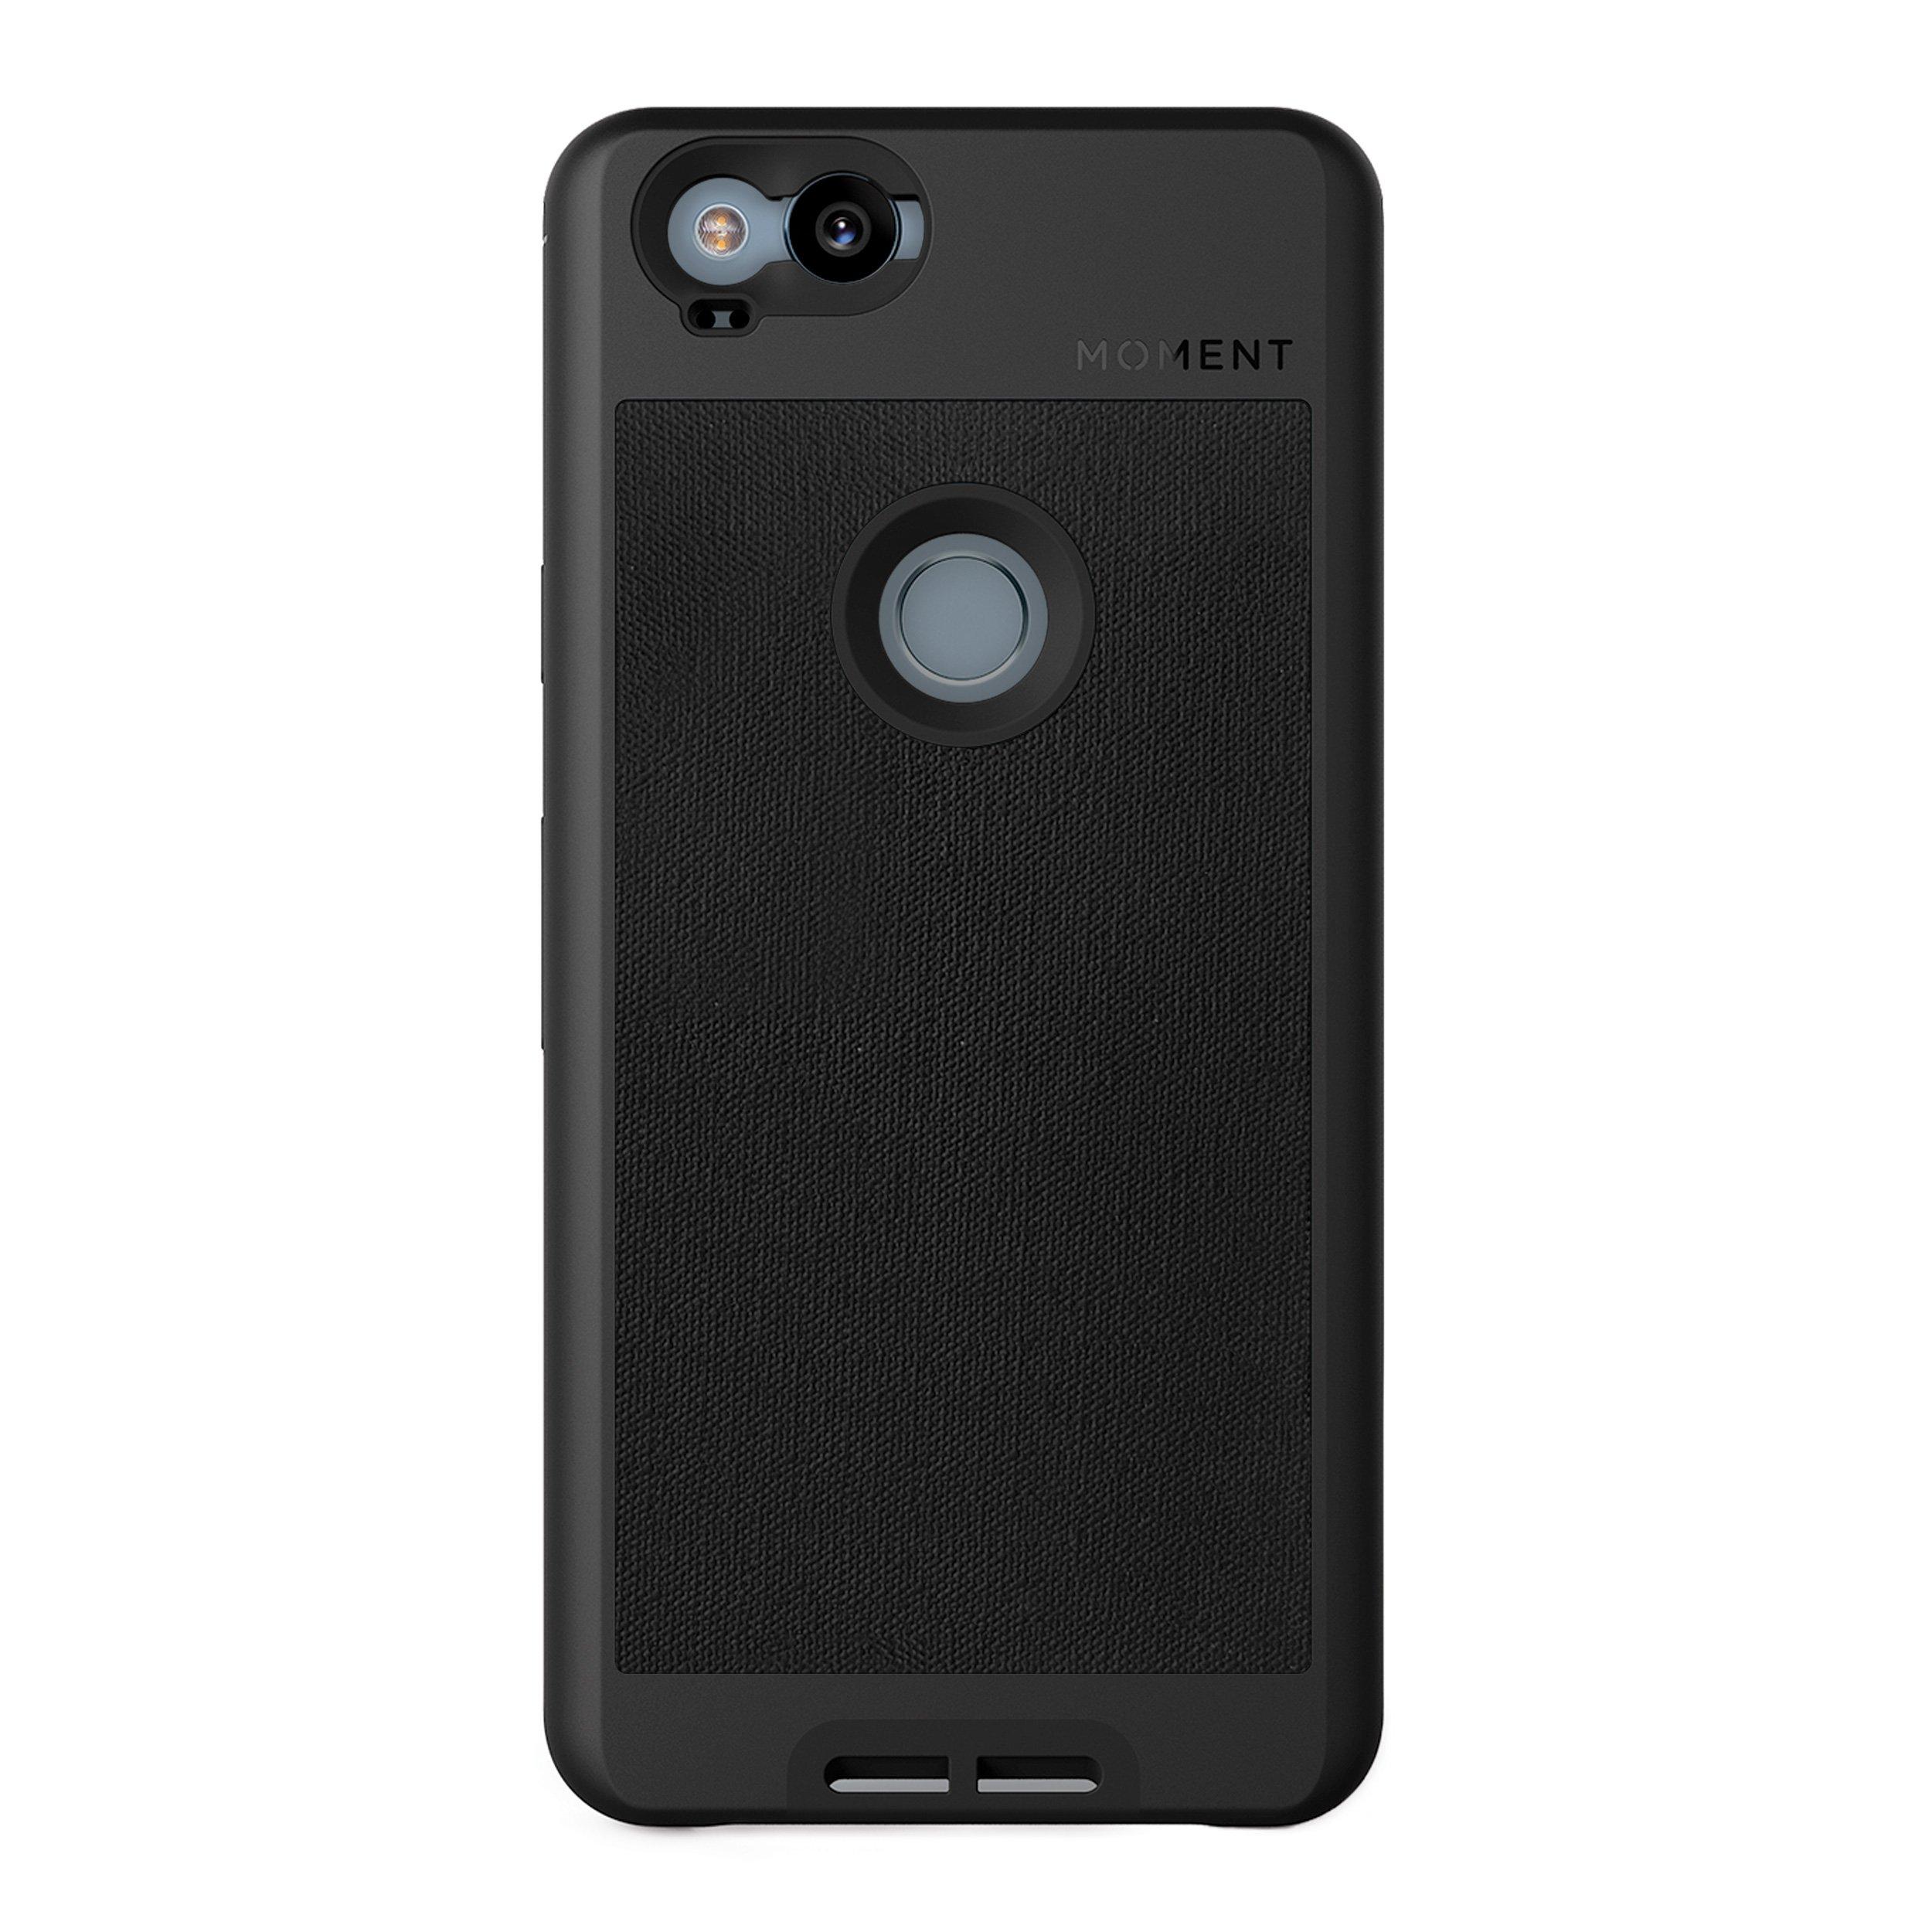 ویکالا · خرید  اصل اورجینال · خرید از آمازون · Pixel 2 Case || Moment Photo Case in Black Canvas - Thin, Protective, Wrist Strap Friendly case for Camera Lovers. wekala · ویکالا